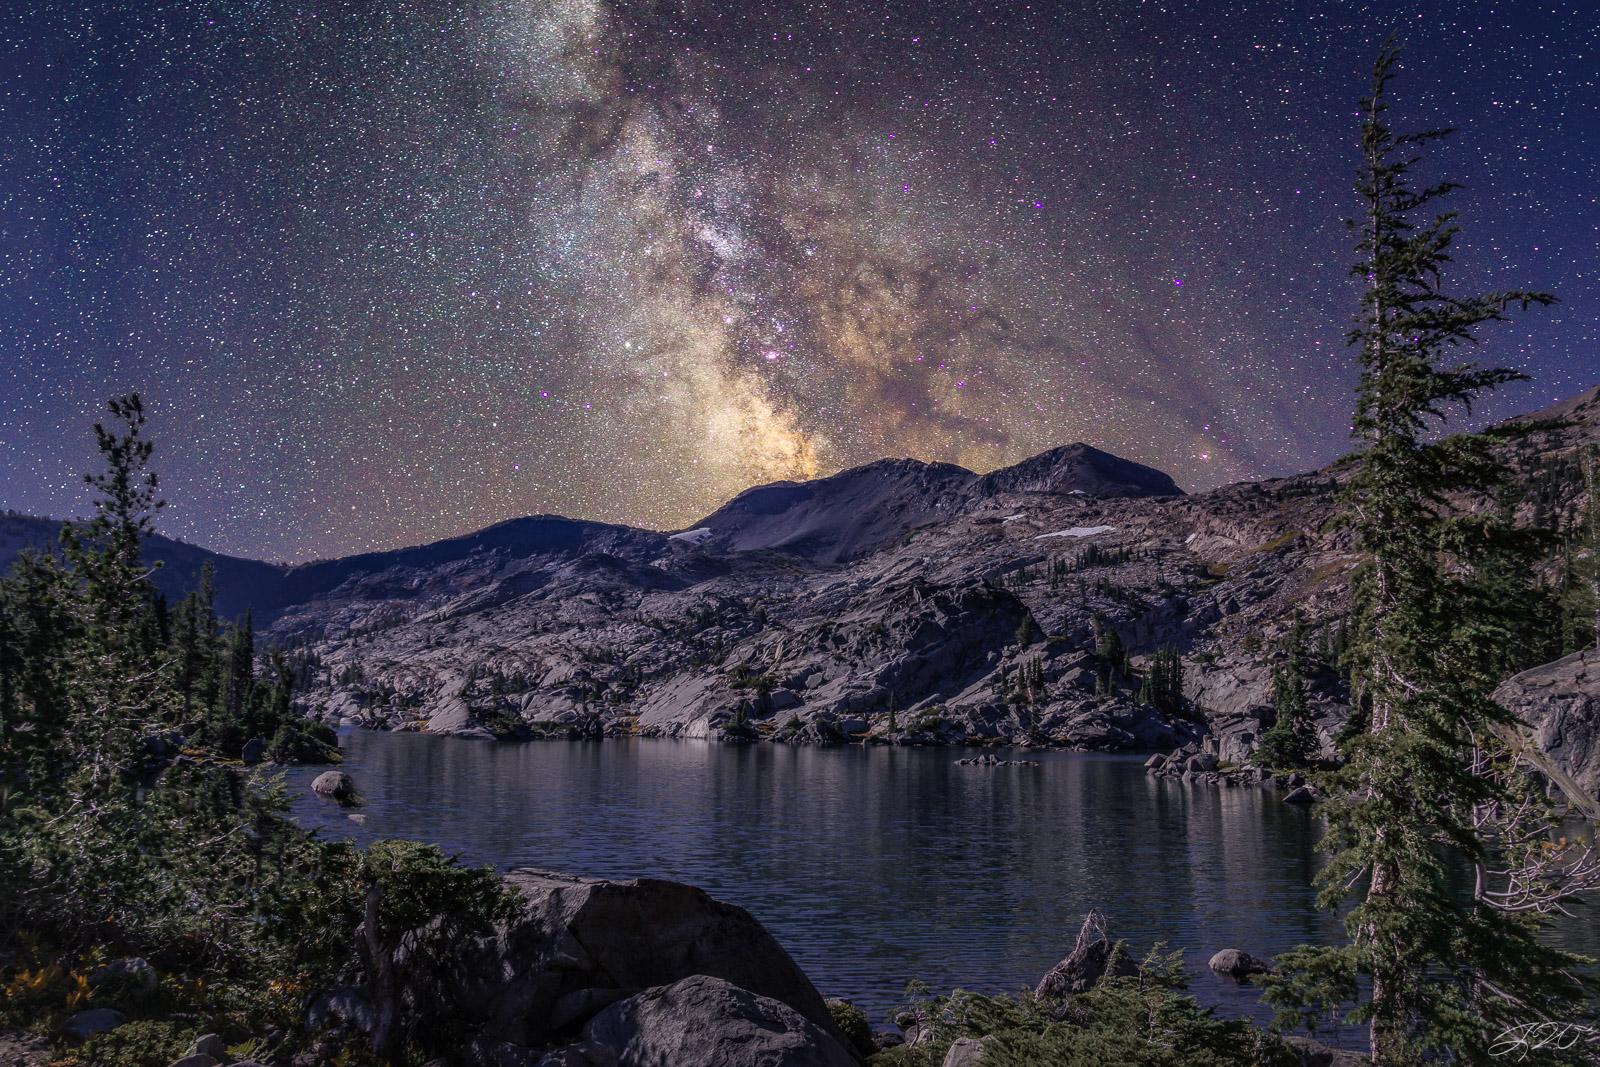 milky way, night sky, astrophotography, mountain, lake, tree, photo